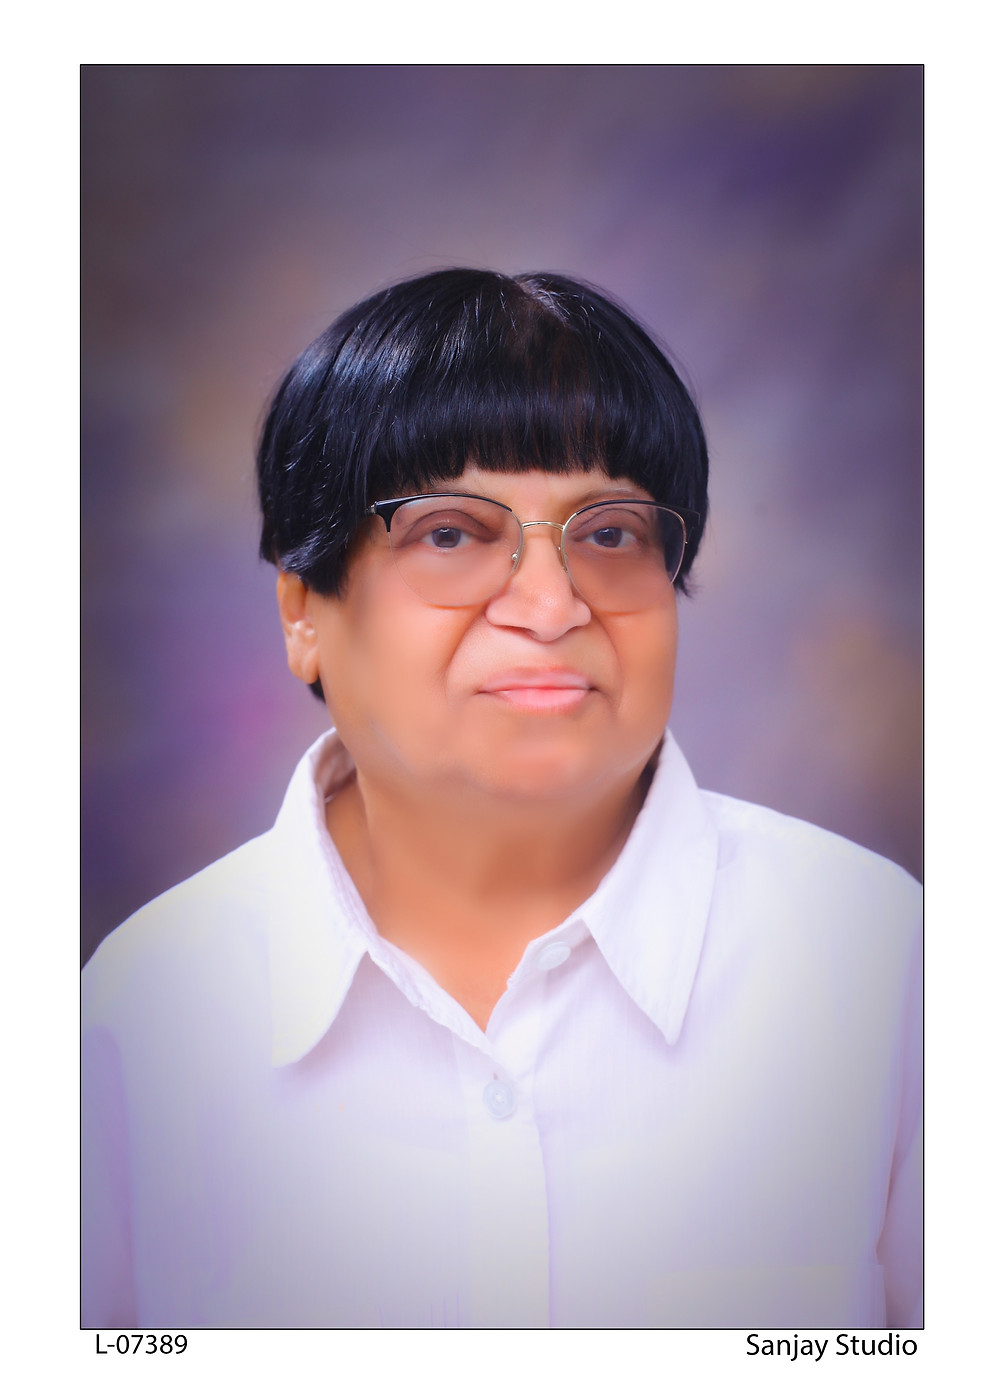 Dr. Kanti Jain Human Benefit Services Khichan India